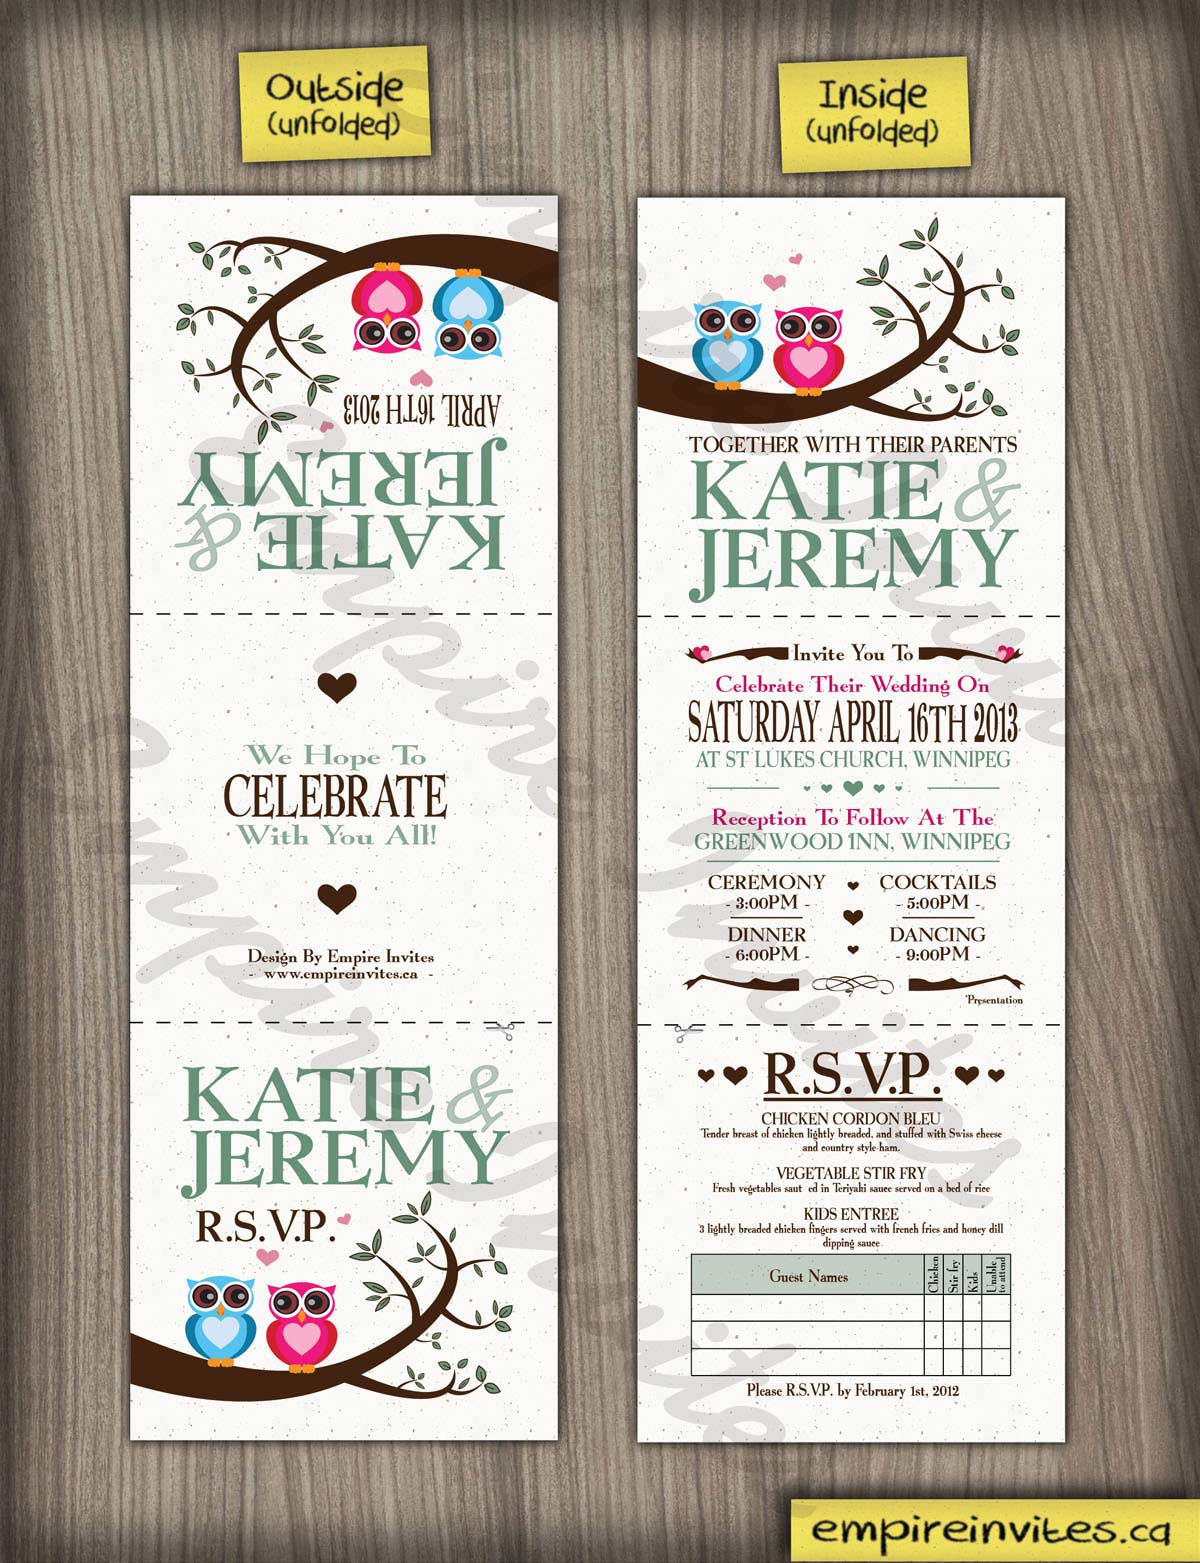 Custom owl wedding invitations From Winnipeg, Canada - EMPIRE INVITES